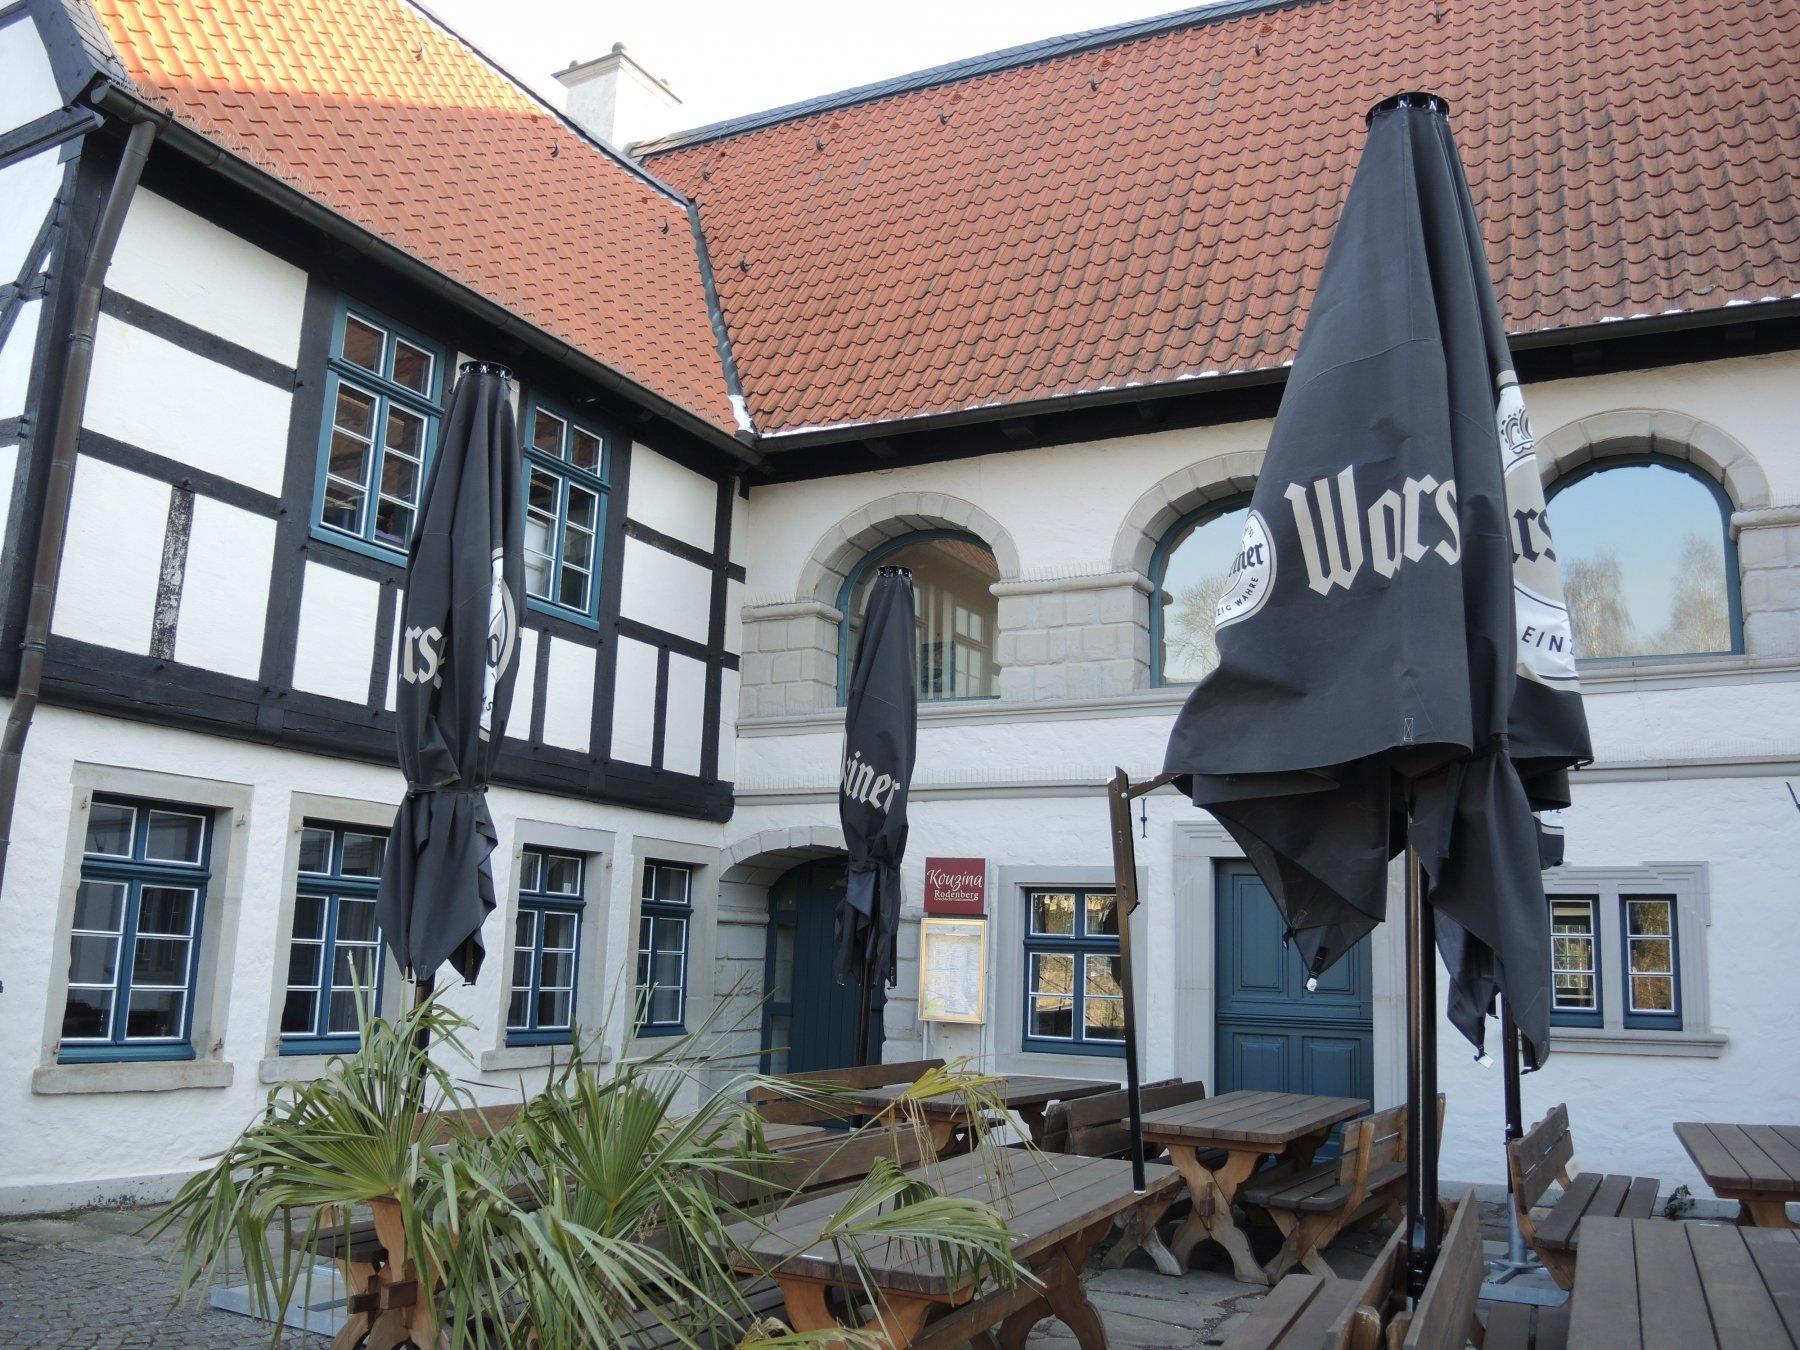 restaurant kouzina im schloss rodenberg bereits wieder geschlossen in stadtmagazine dortmund. Black Bedroom Furniture Sets. Home Design Ideas